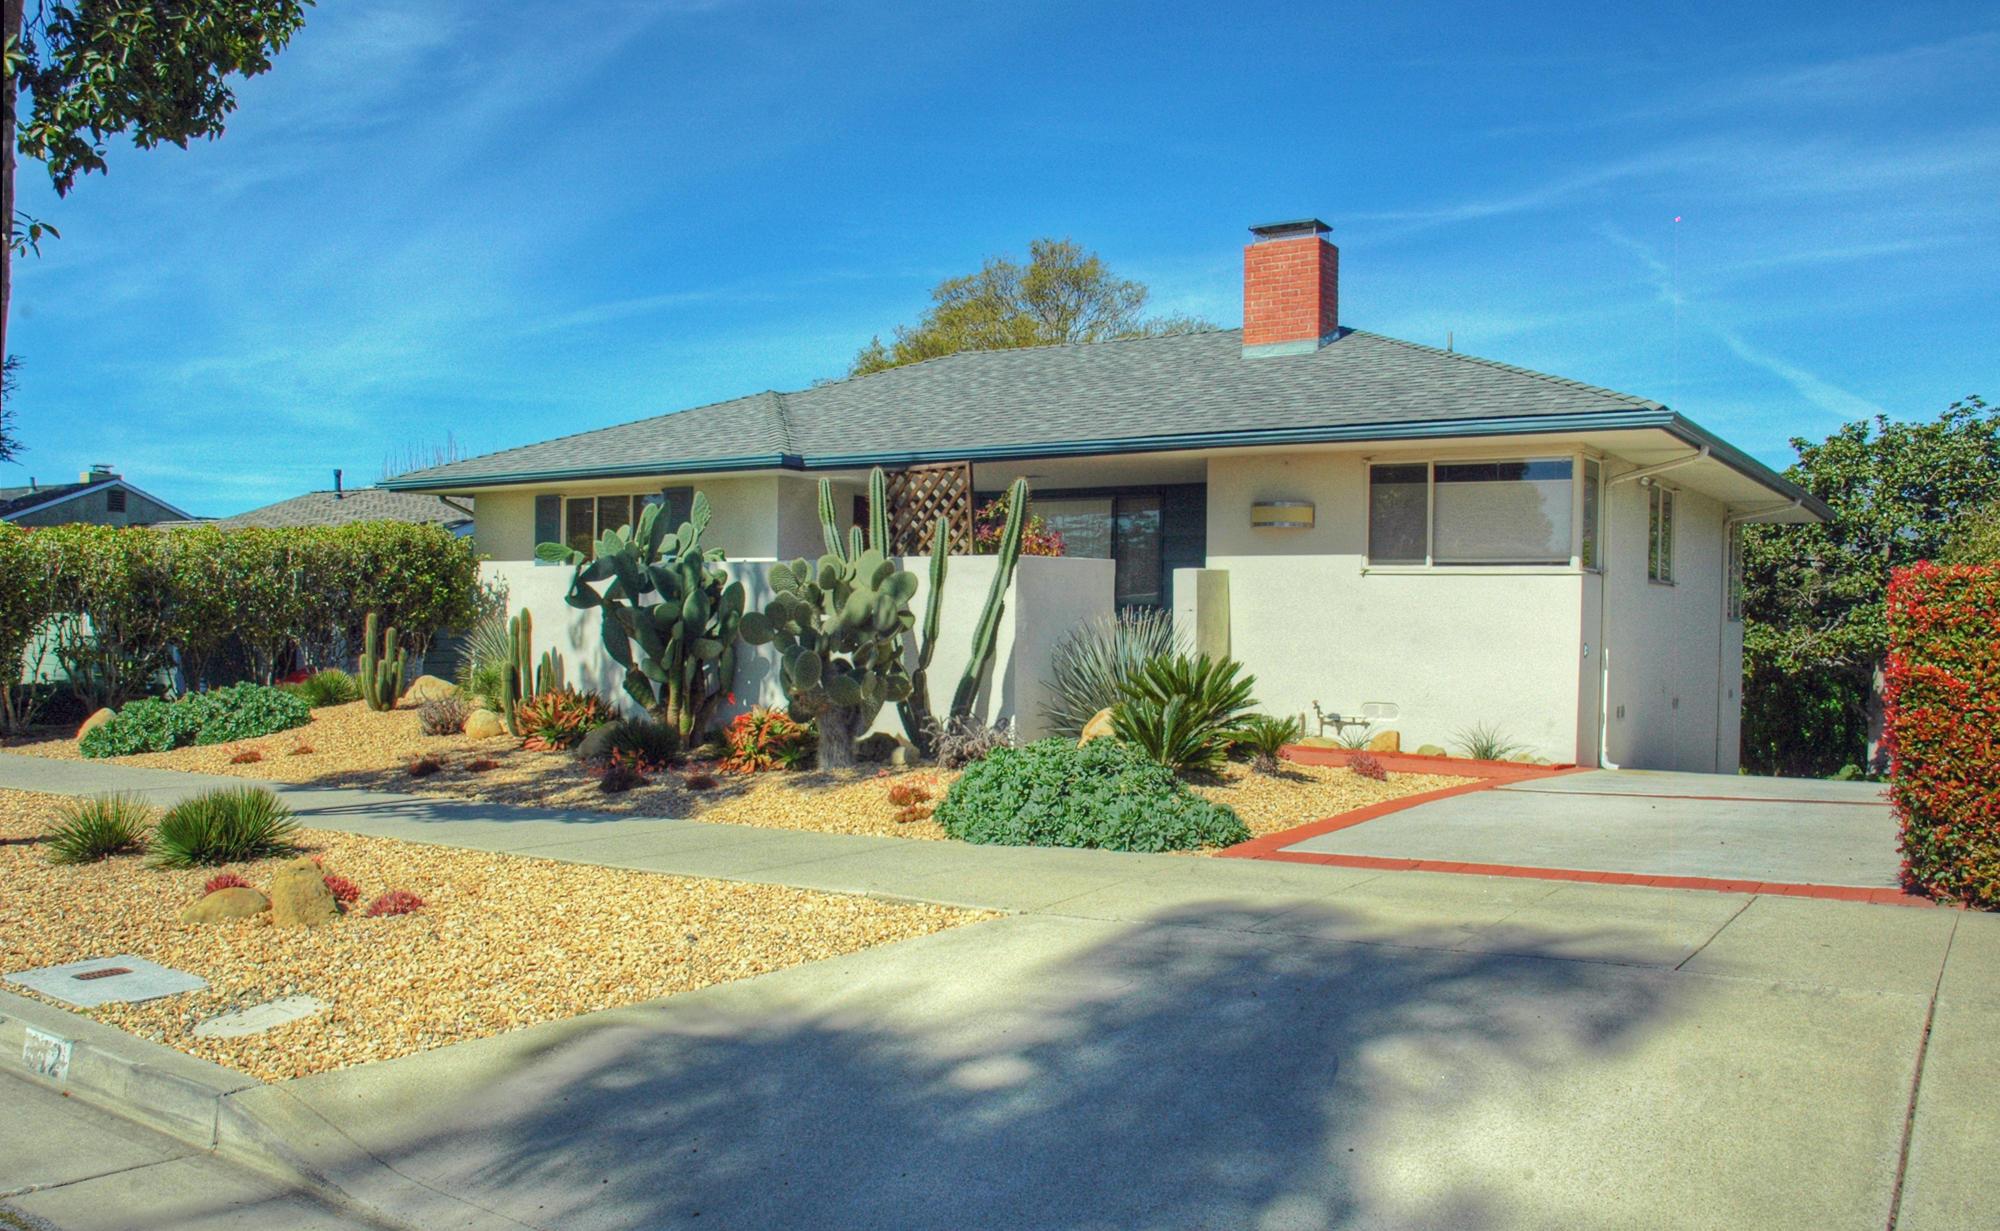 Property photo for 312 Samarkand Dr Santa Barbara, California 93105 - 17-841